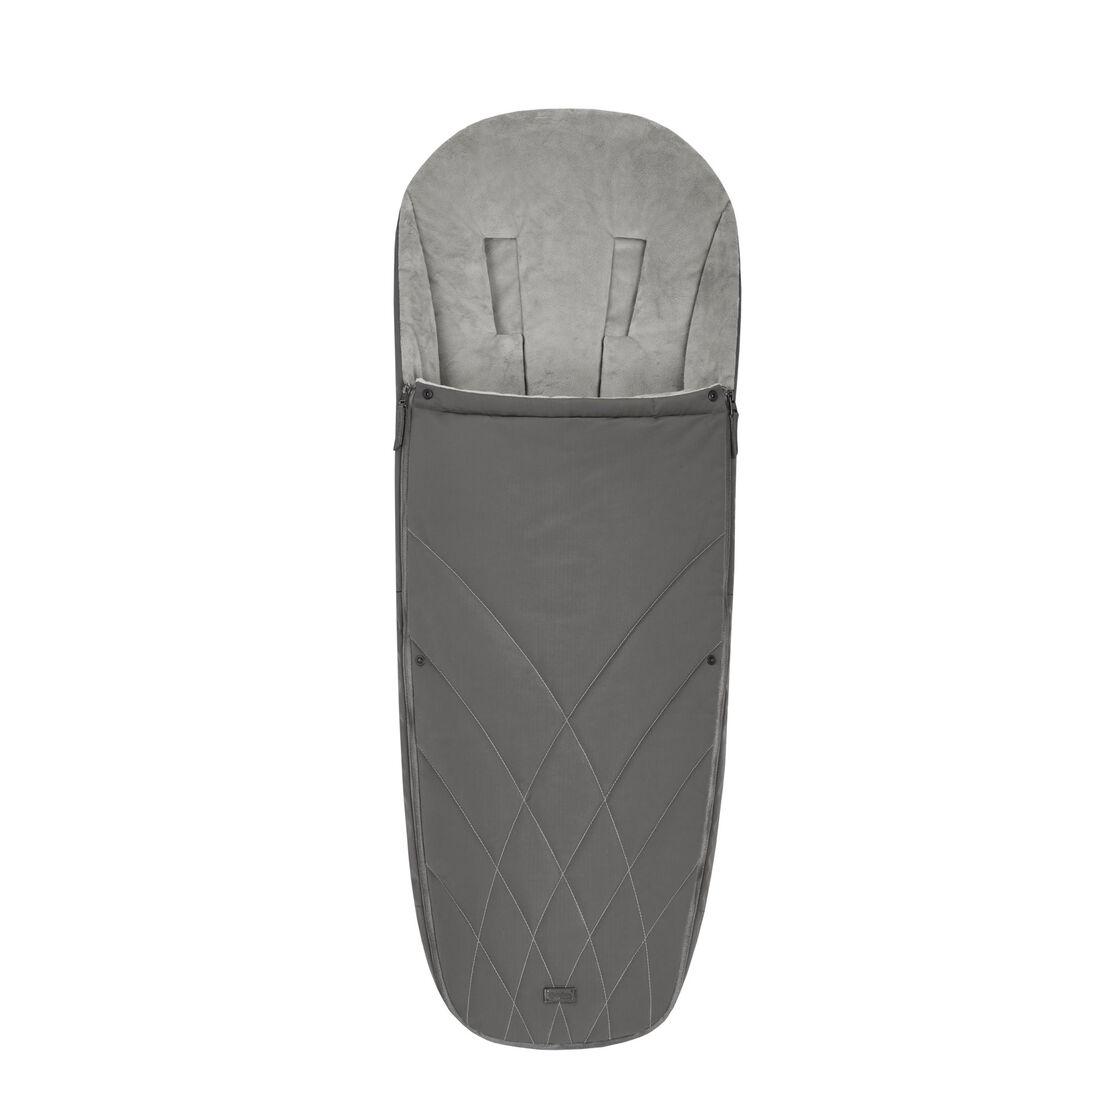 CYBEX Platinum Fußsack - Soho Grey in Soho Grey large Bild 1